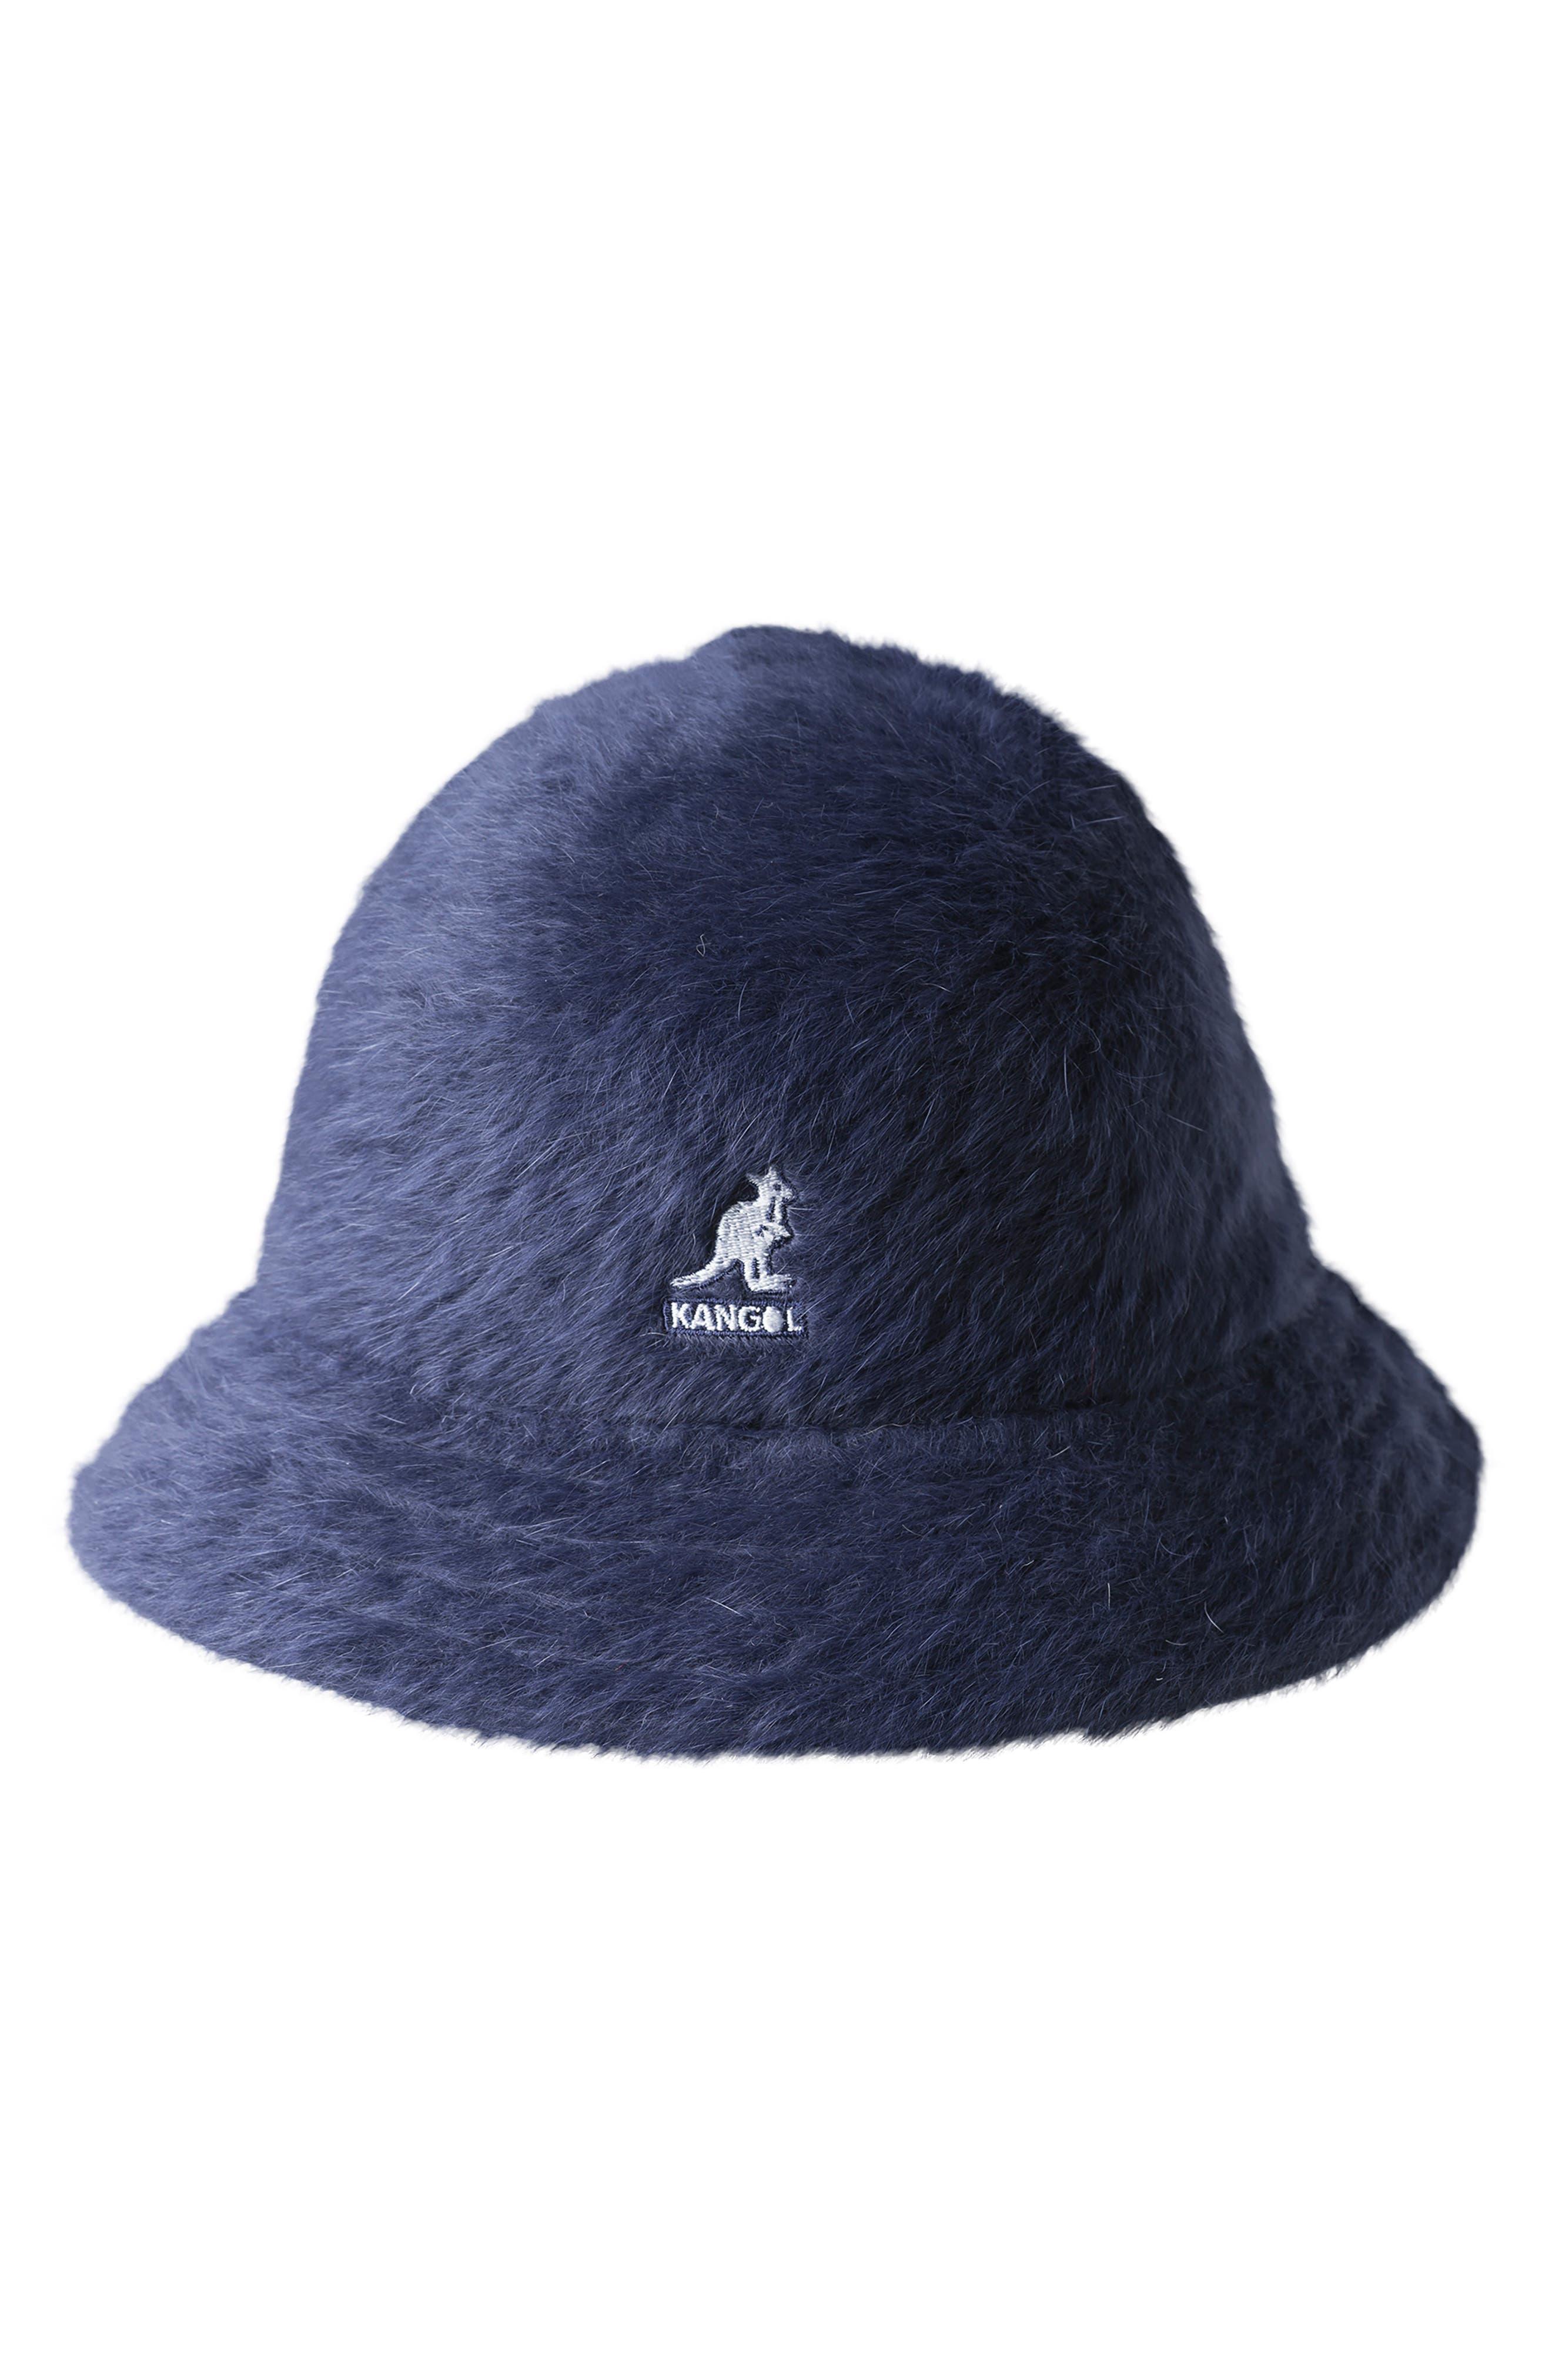 bb4d820394fe Shop kangol furgora casual bucket hat blue in navy jpg 780x1196 80s bucket  hats